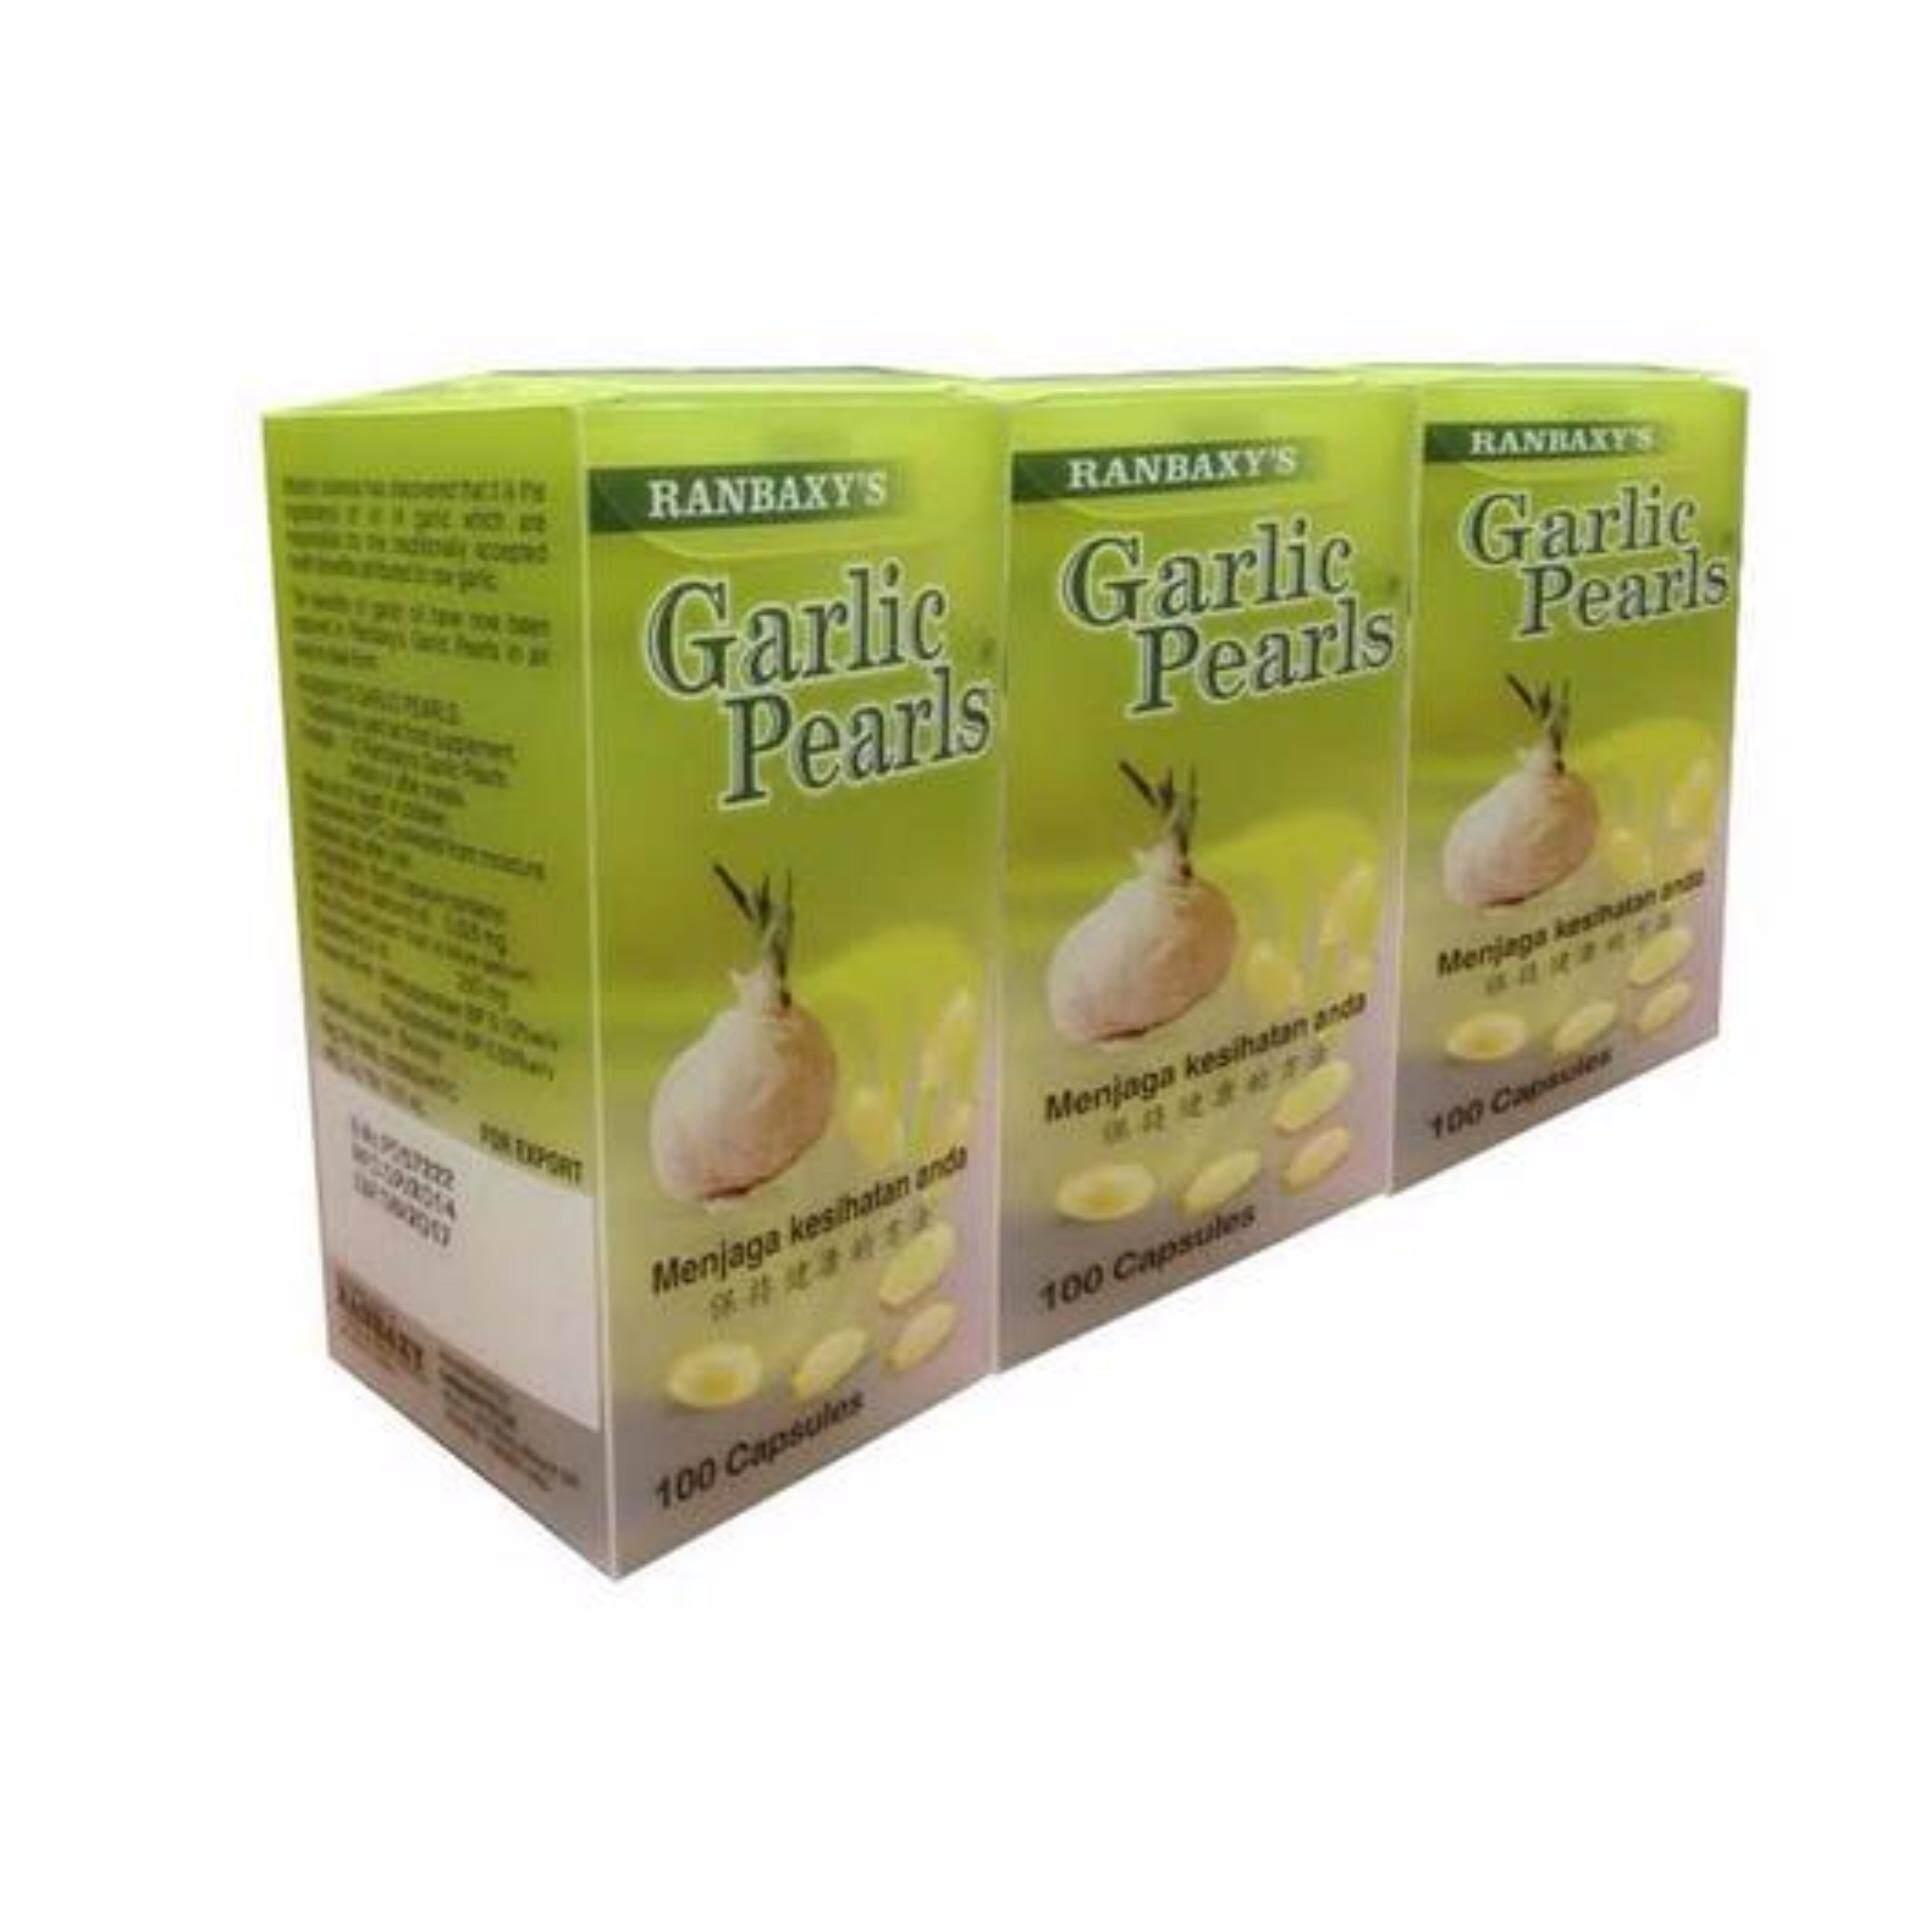 Ranbaxy Garlic Pearls 100 Capsules X 3 tins